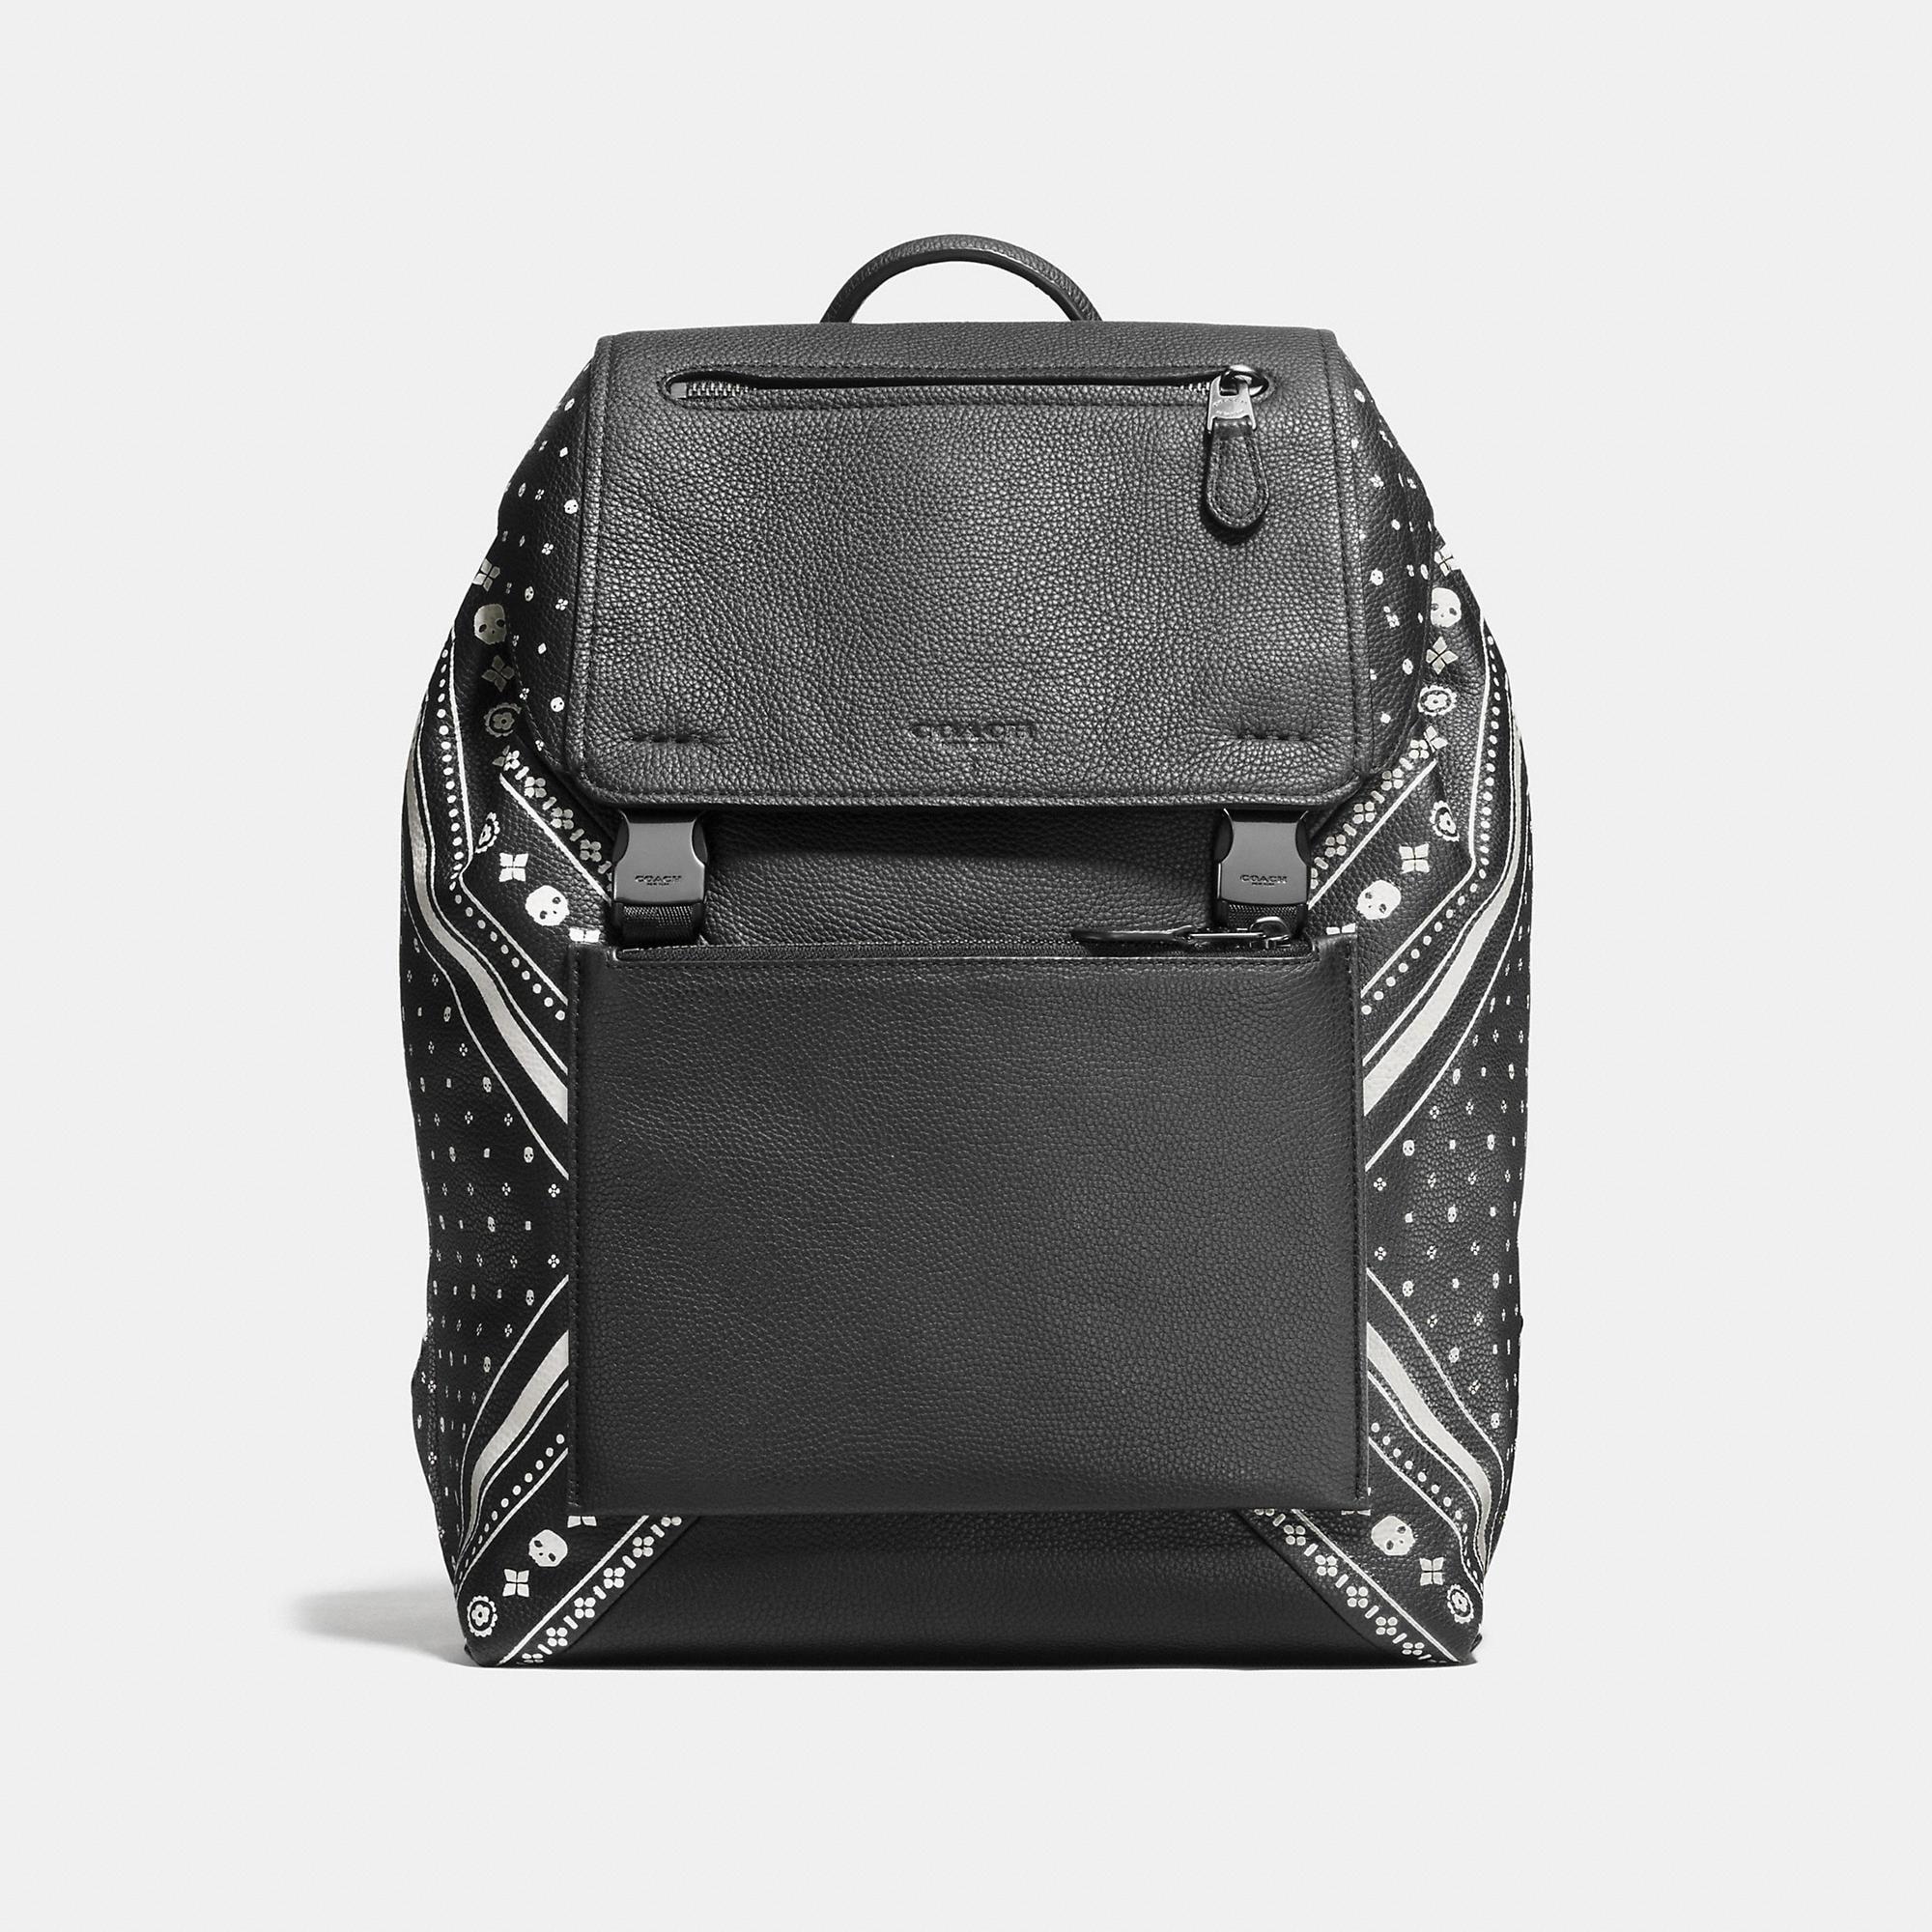 Coach Manhattan Backpack In Bandana Patchwork Leather